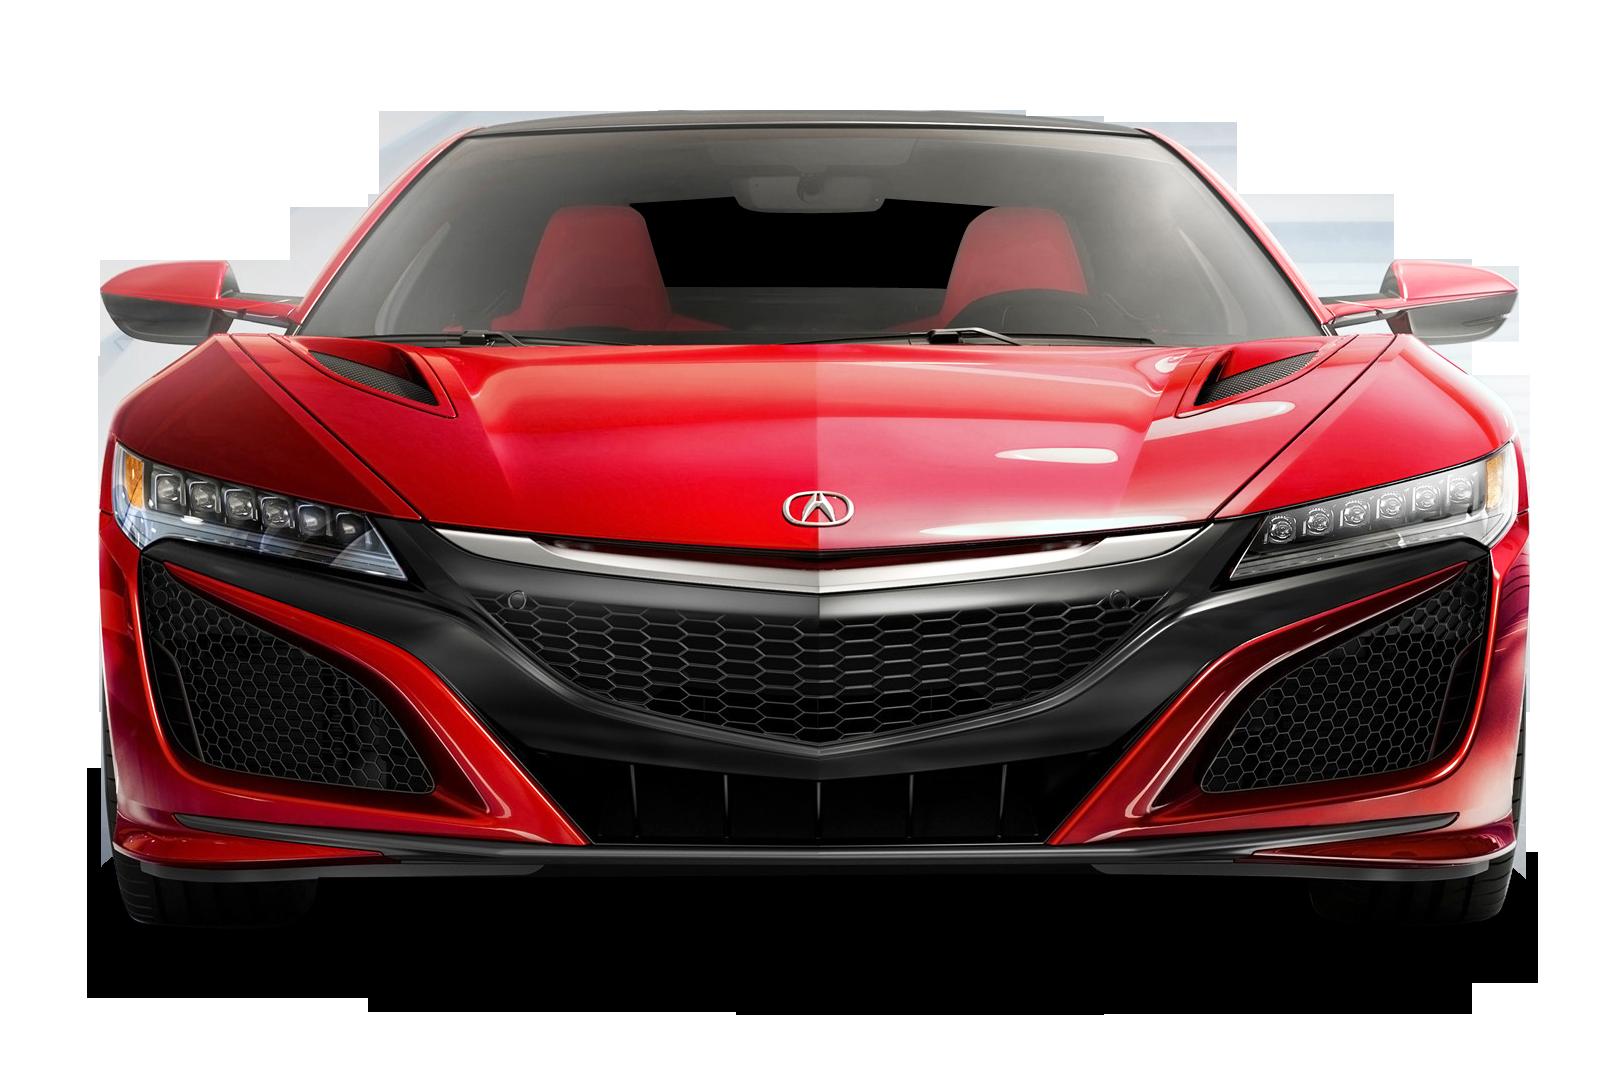 Red Acura Nsx Car Nsx Acura Nsx Honda Nsx 2015